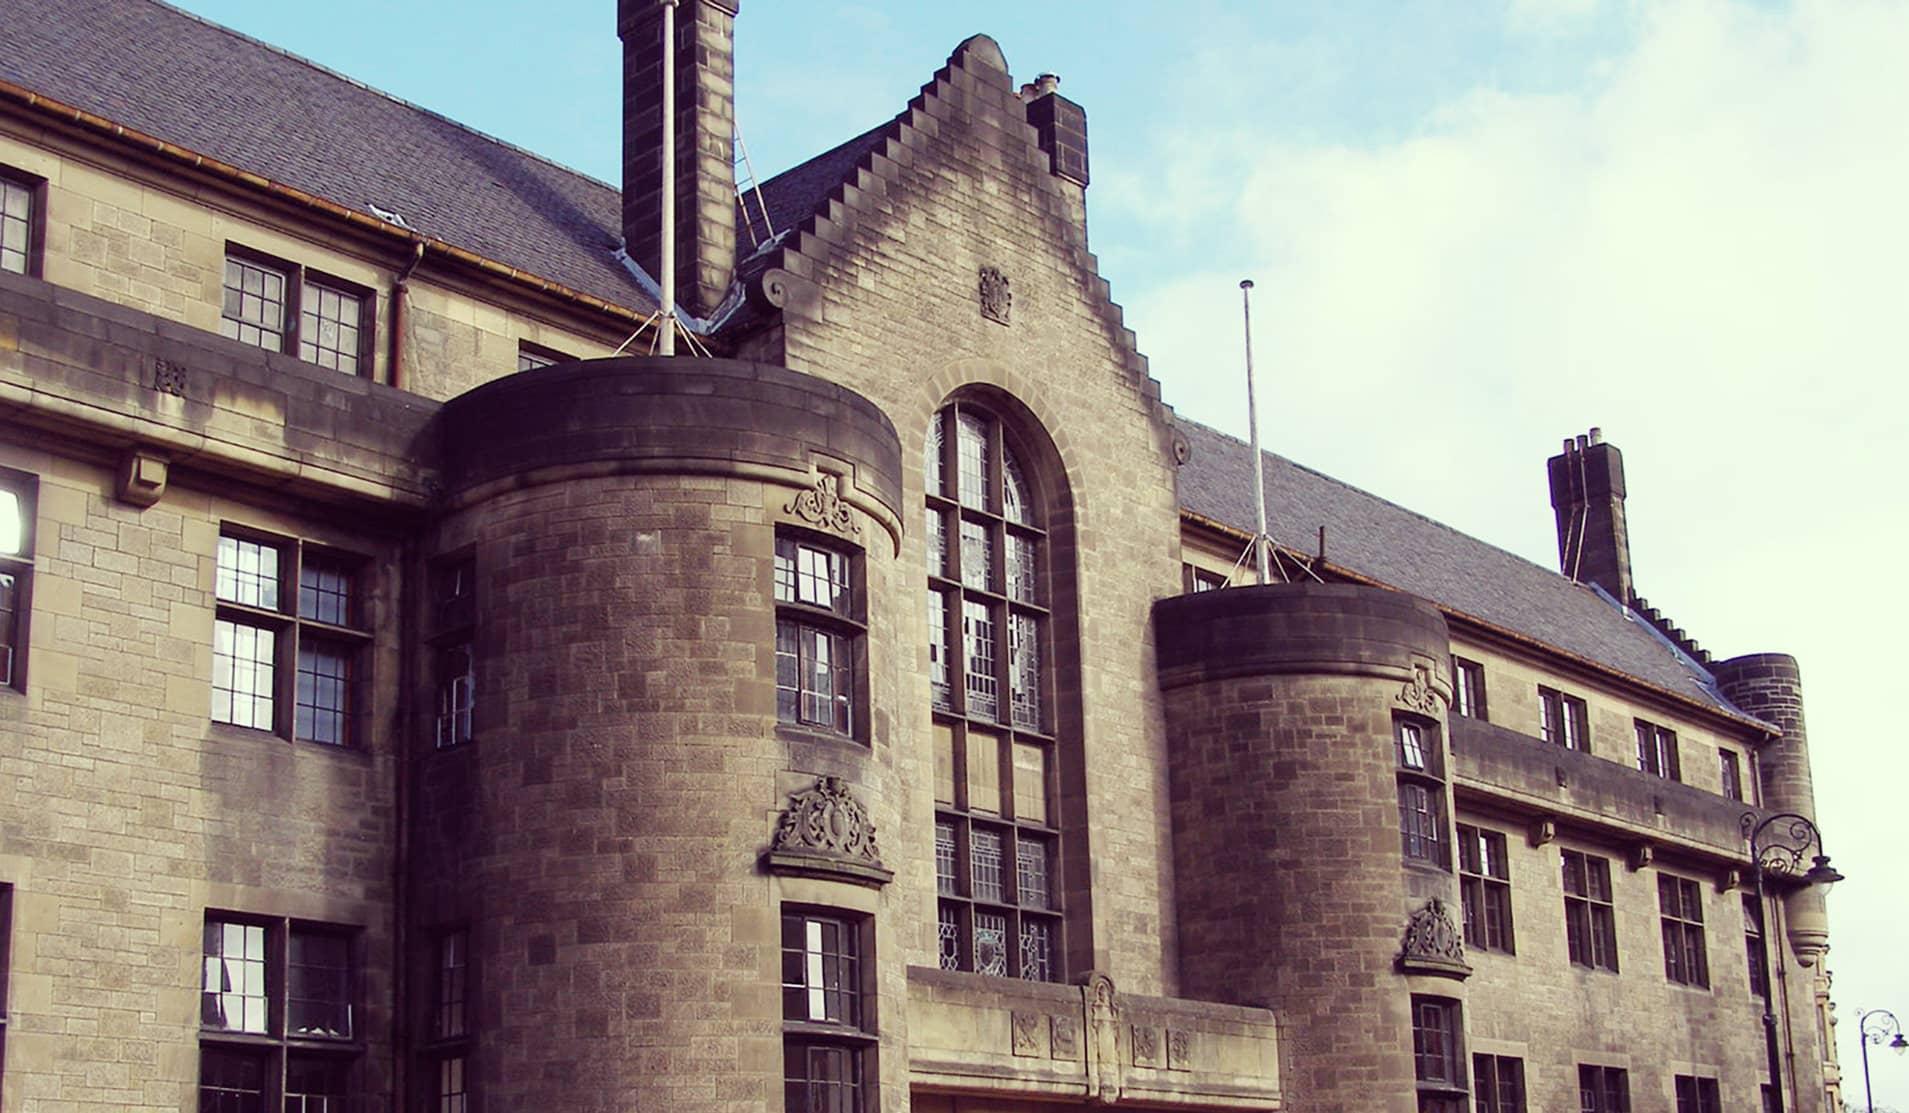 Glasgow University Union